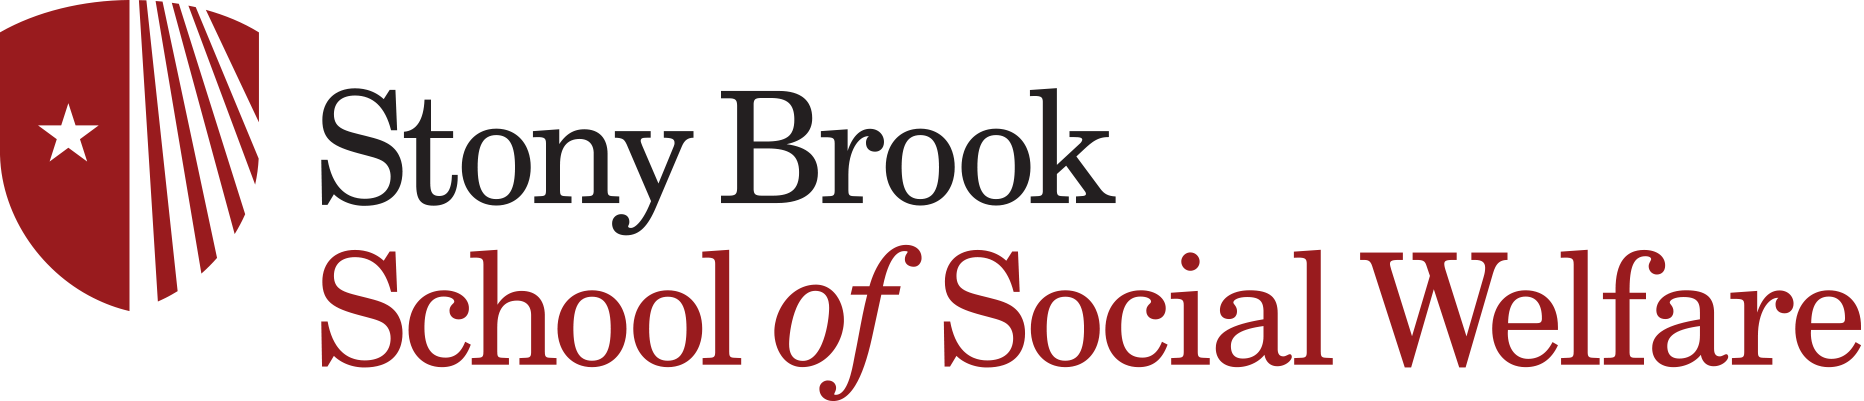 Sbu Academic Calendar.Academic Calendars Stony Brook University School Of Social Welfare